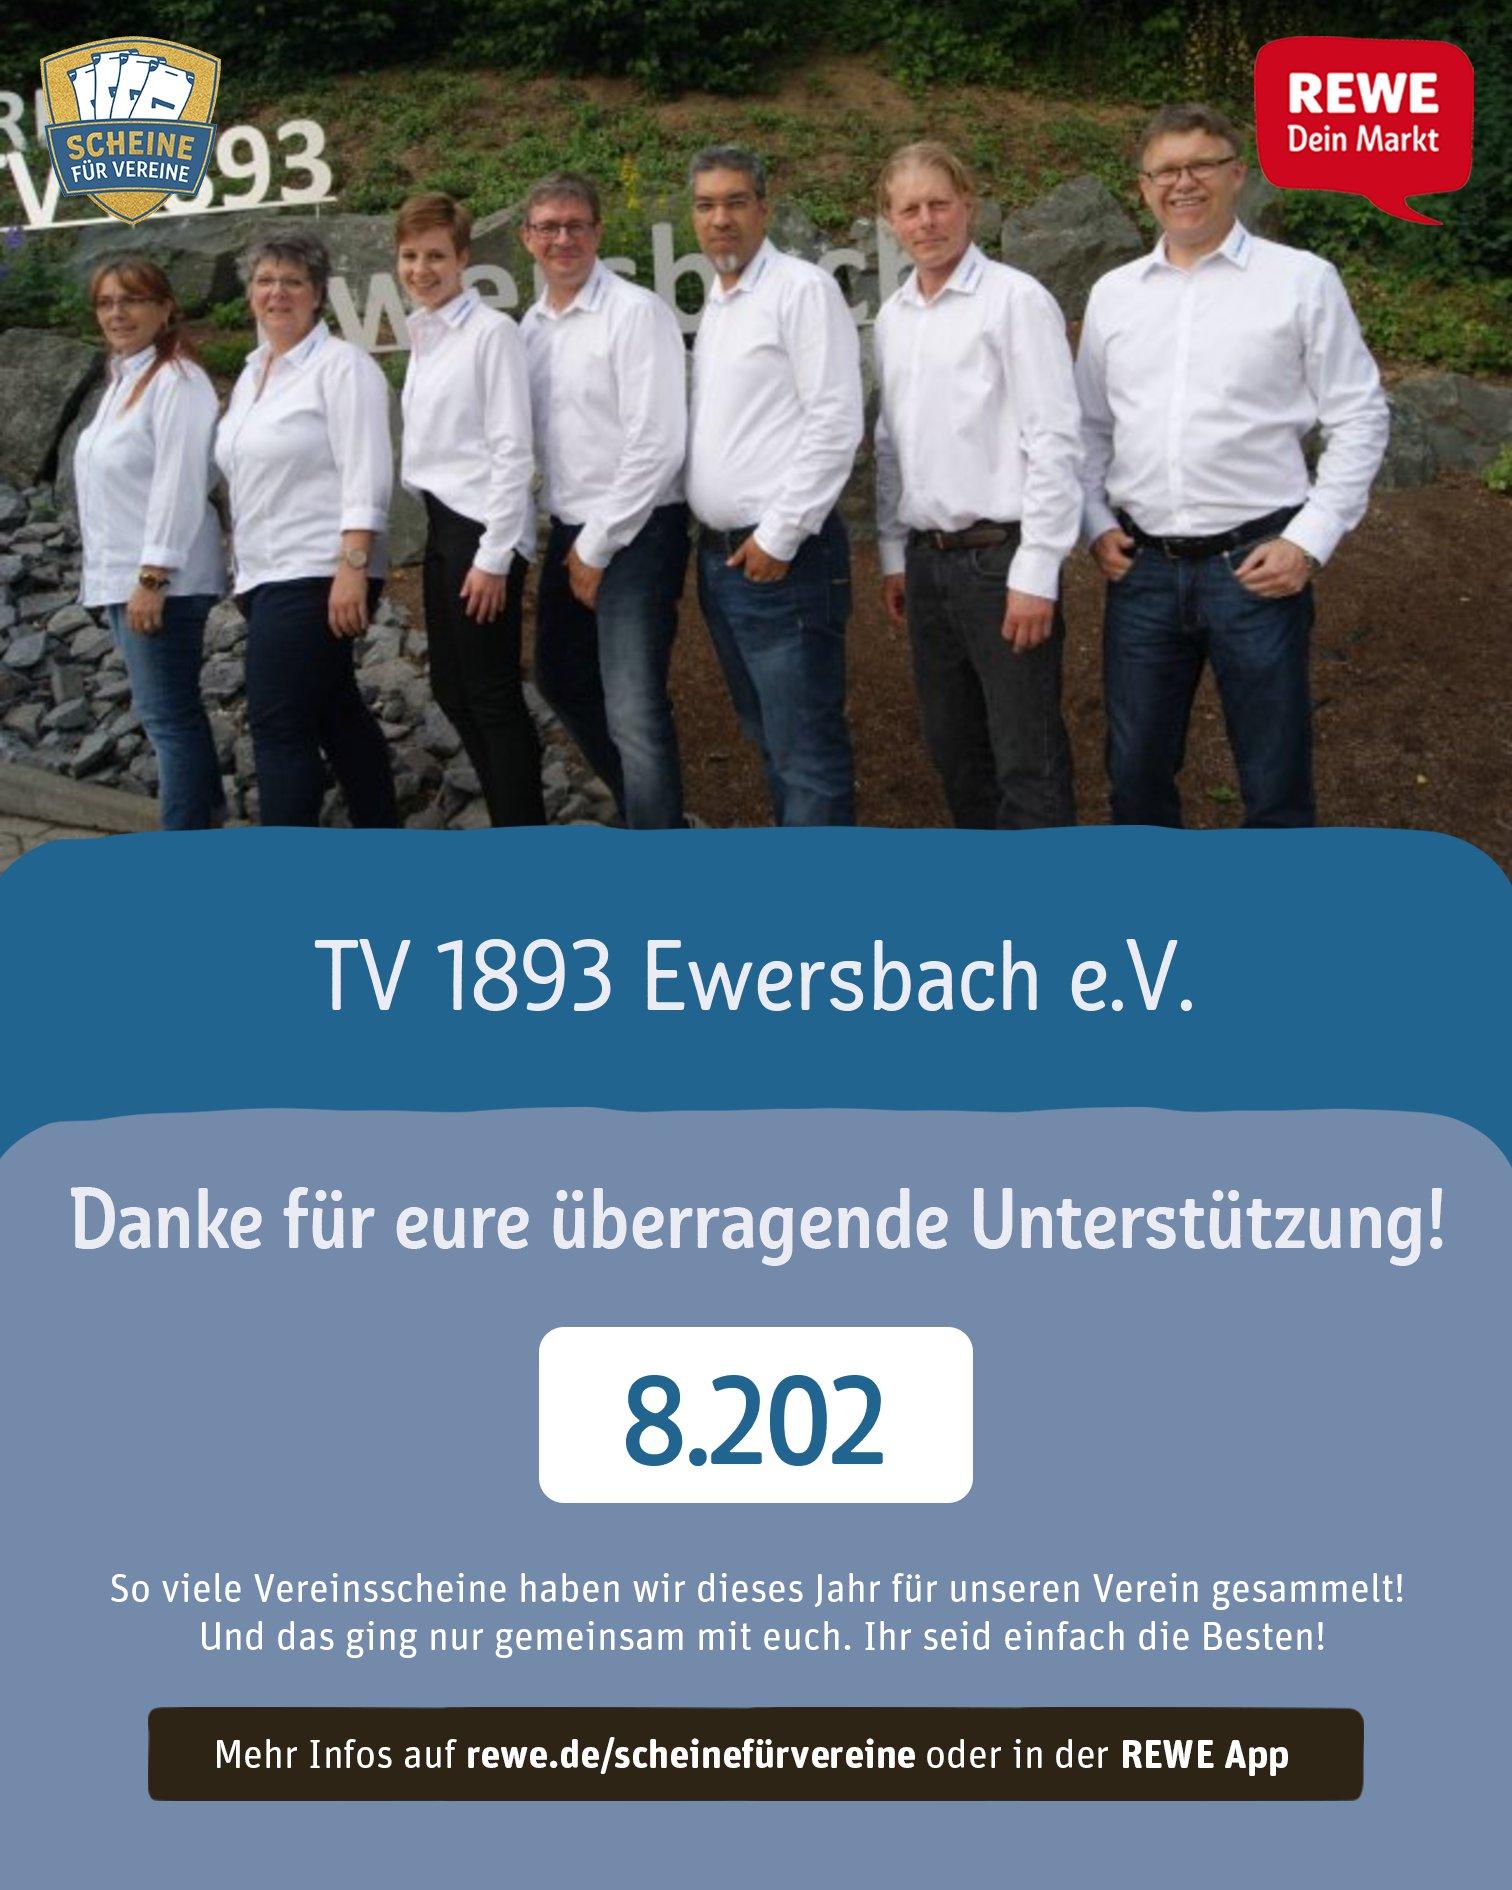 TV 1893 Ewersbach